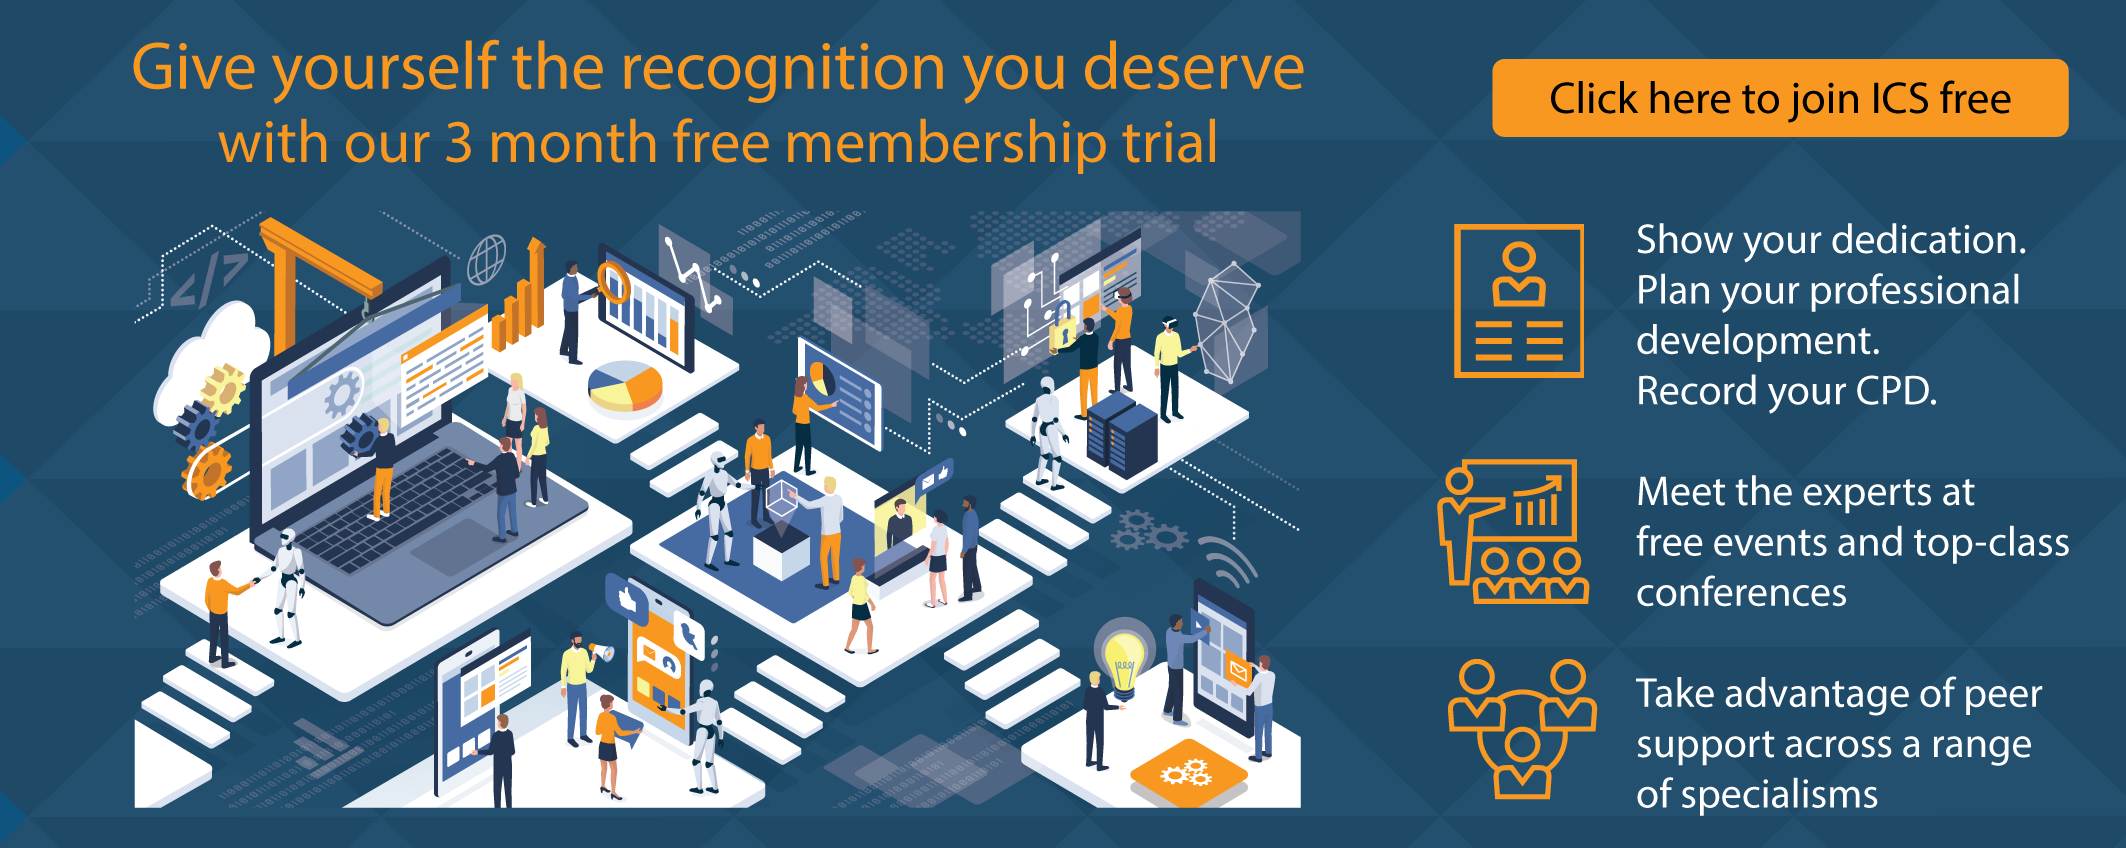 ICS Free Trial